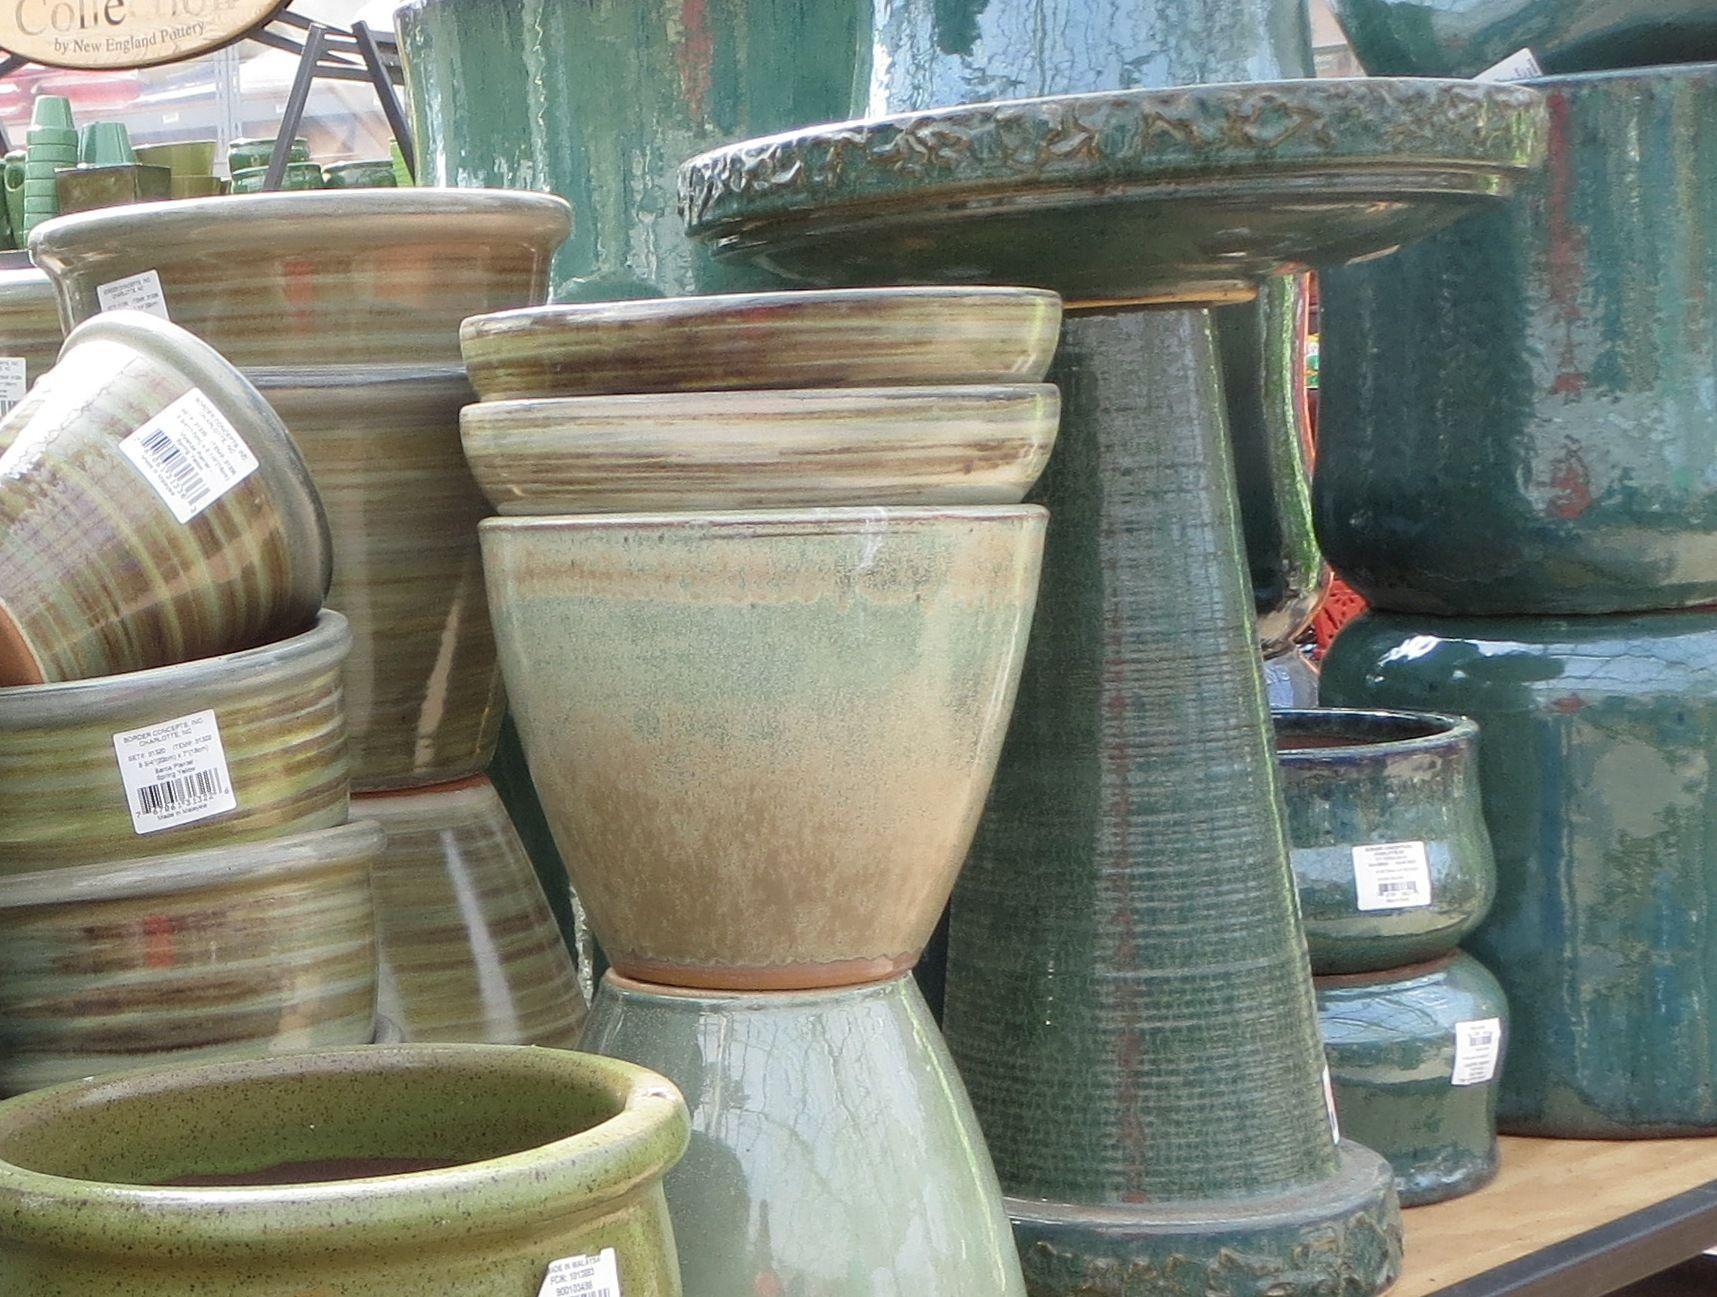 Bristol's Garden Center (Victor, NY) has new pottery and